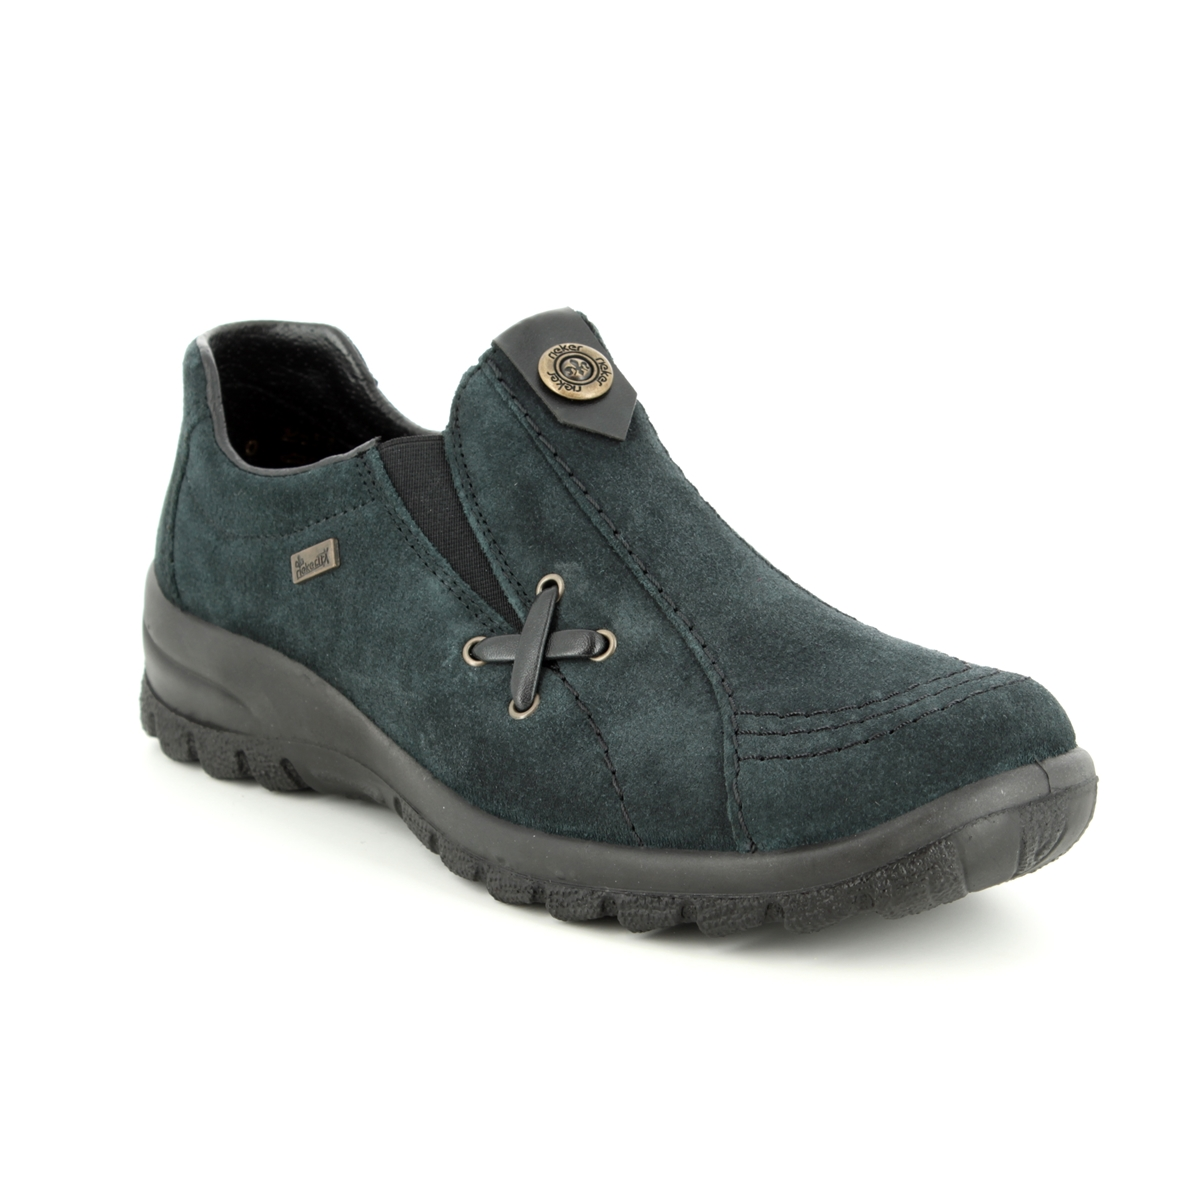 9415e58ecd Rieker Comfort Shoes - Navy suede - L7171-14 EIKESU